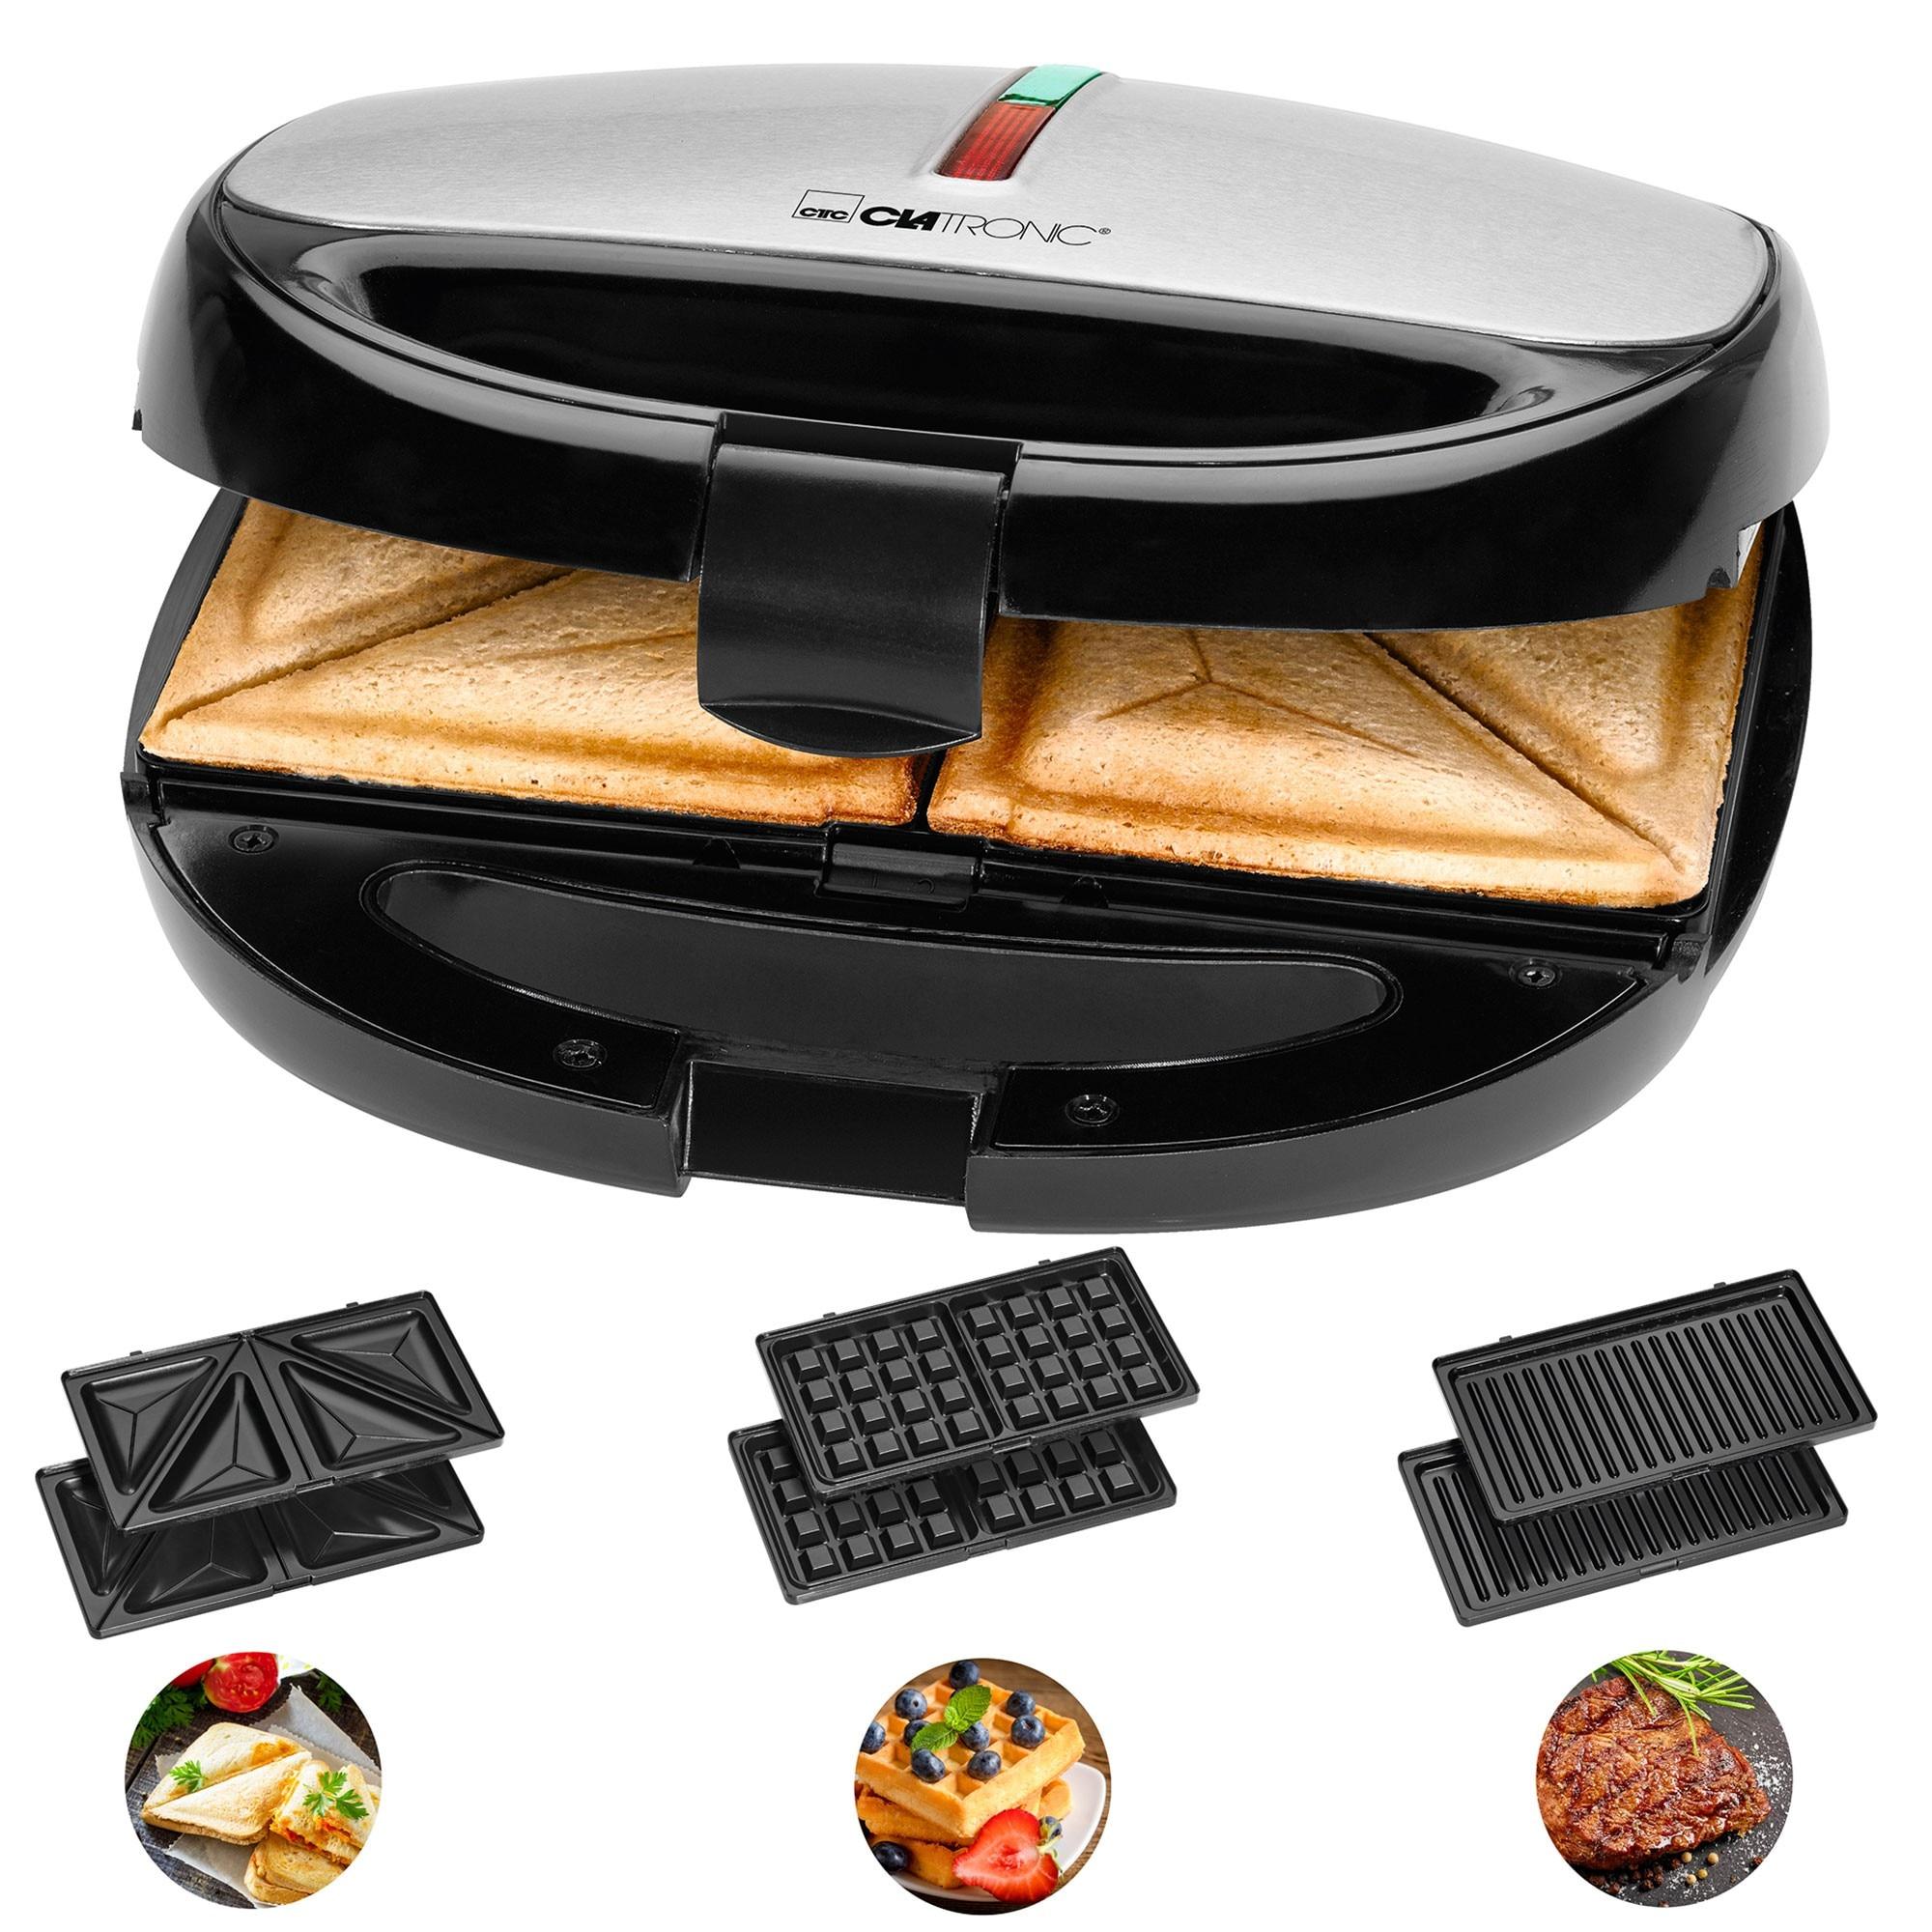 Clatronic ST 3670 Sandwich Interchangeable Plates, Sandwich Toaster, Waffle Iron Belgian Waffle, Grill Iron Machine Meat Fish